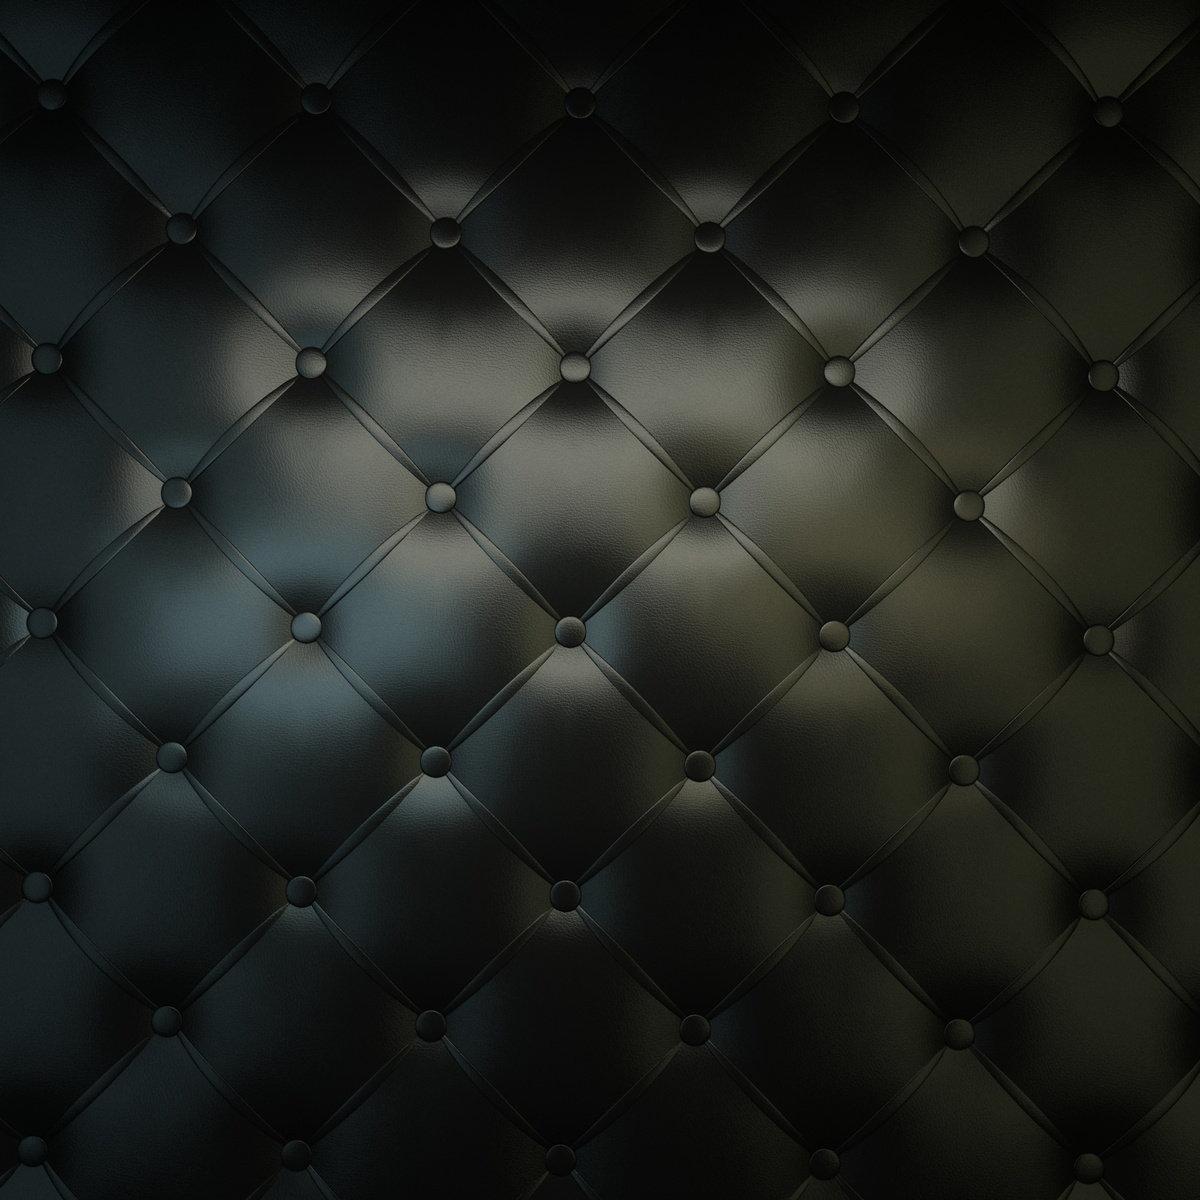 fond cuir noir capitonne.jpg